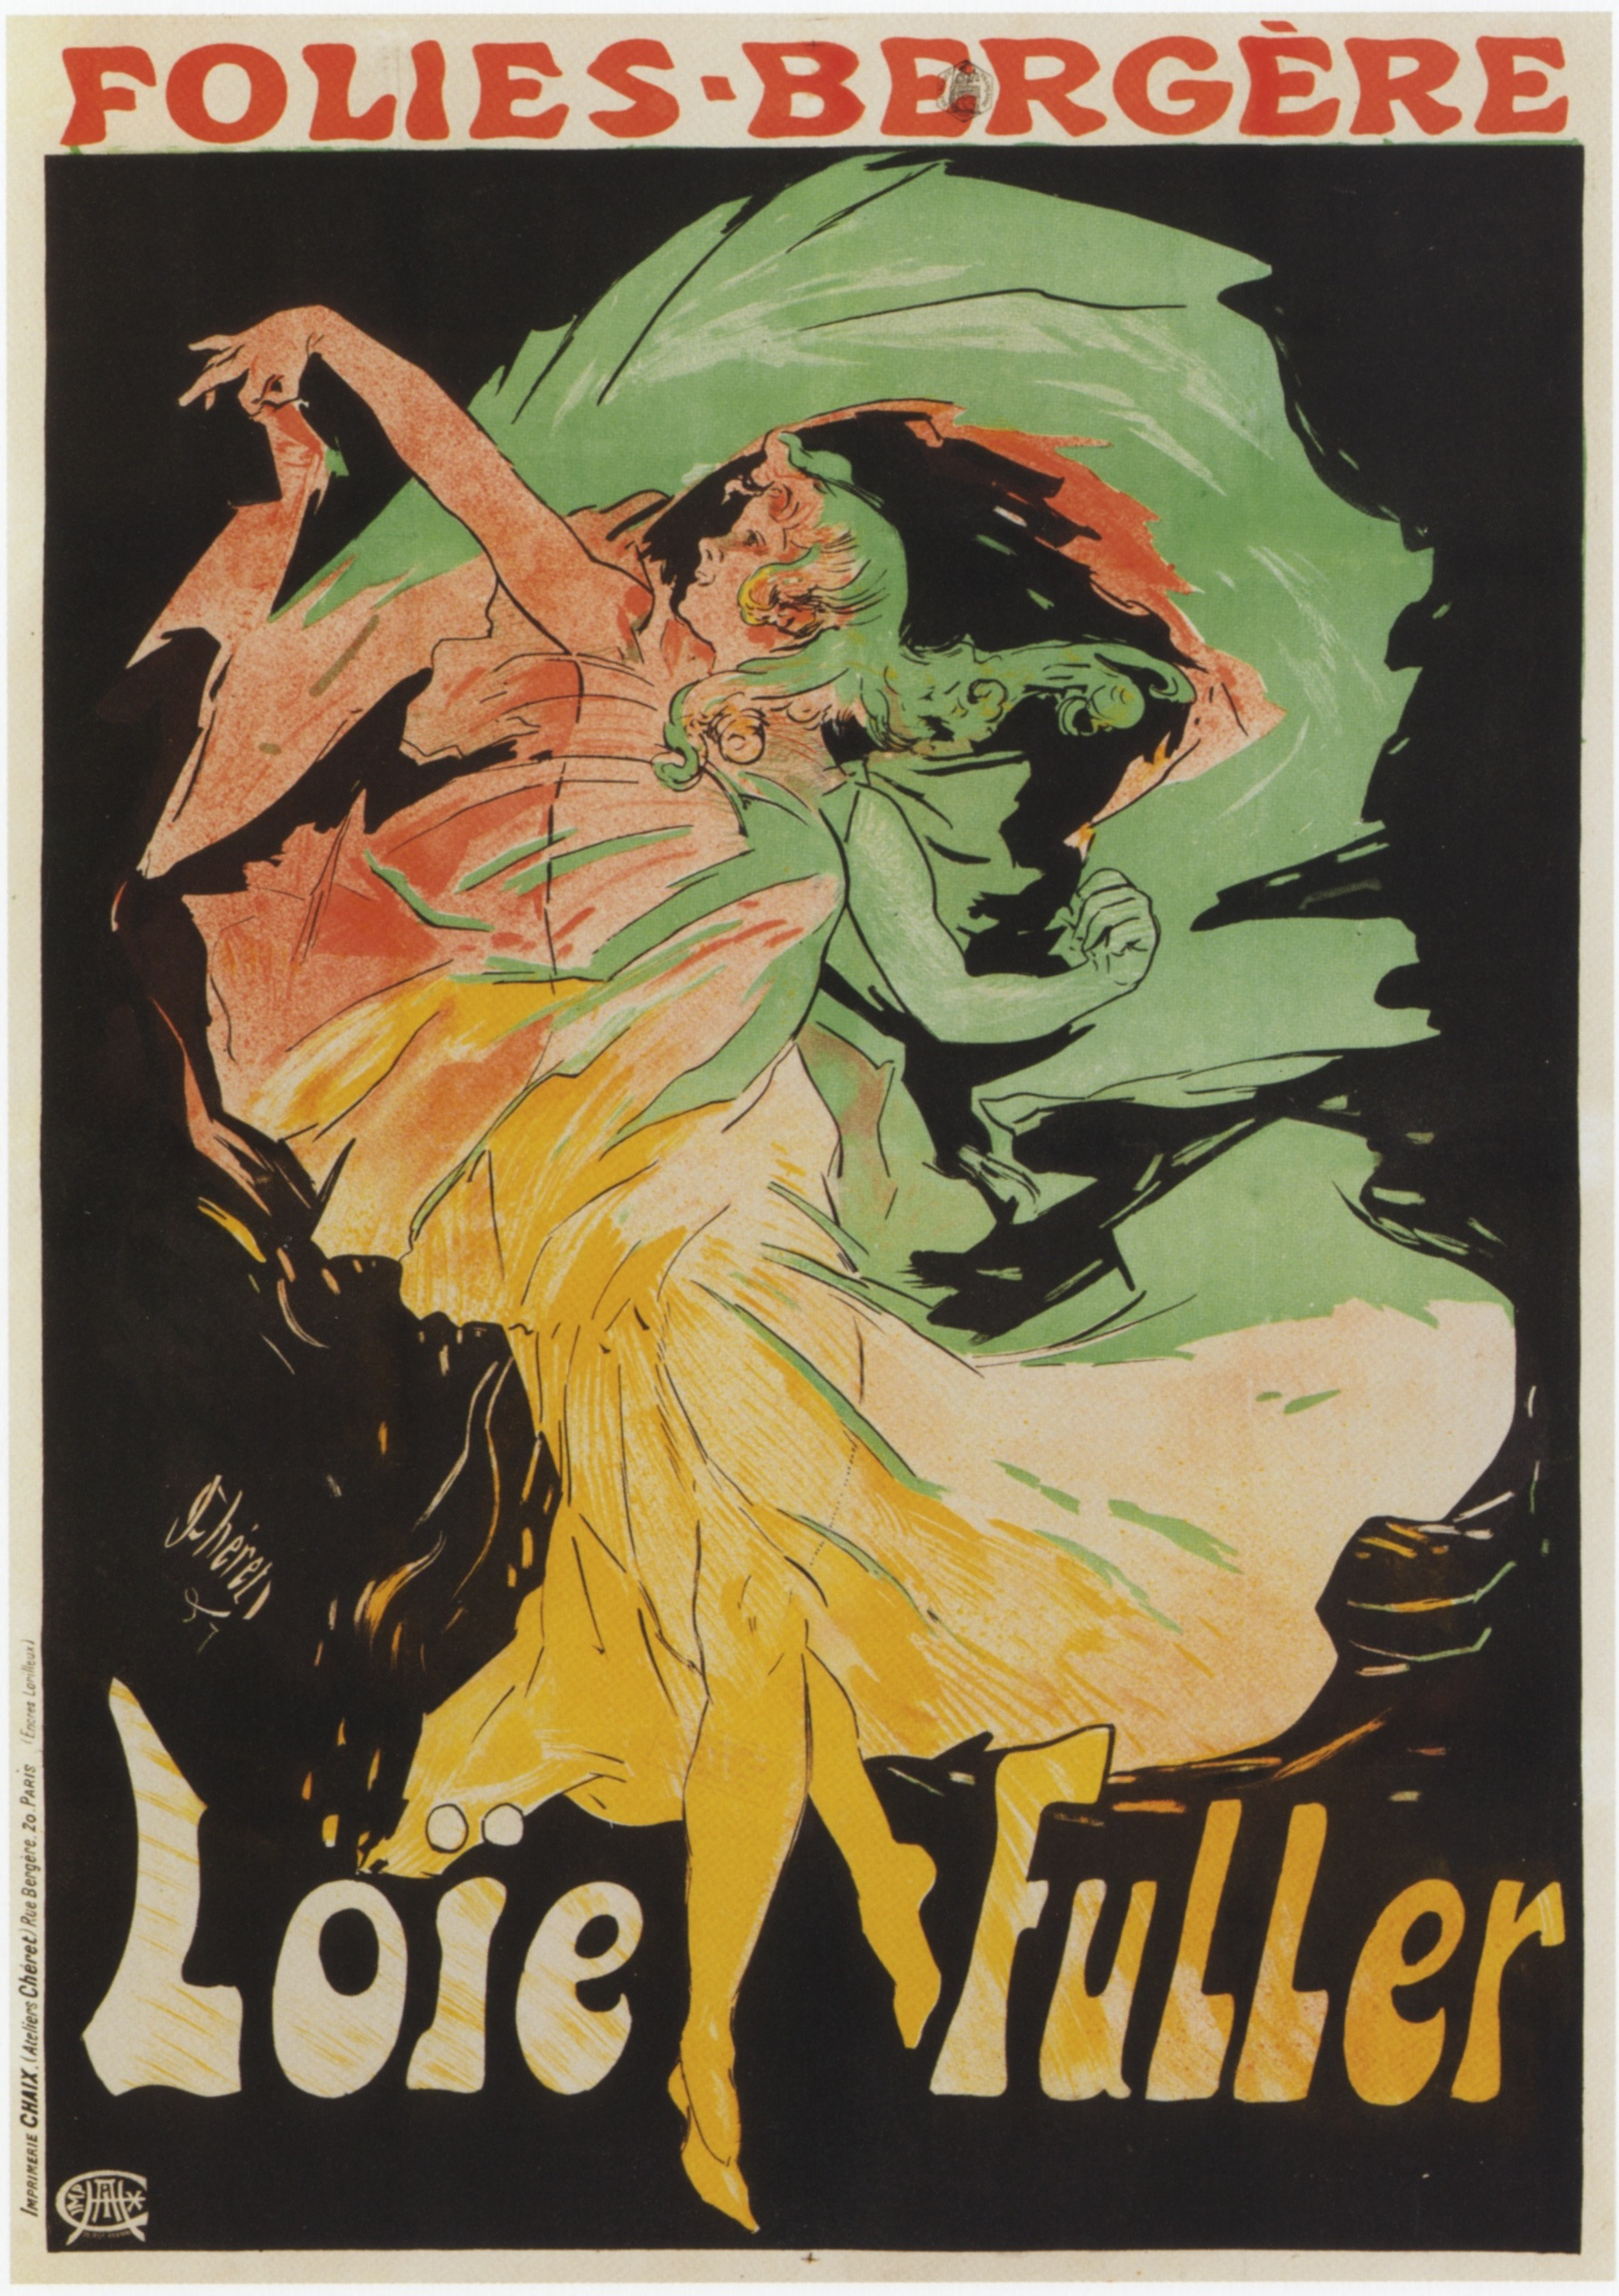 Jules Chéret,  Folies Bergere: Loïe Fuller , advertising poster, 1897